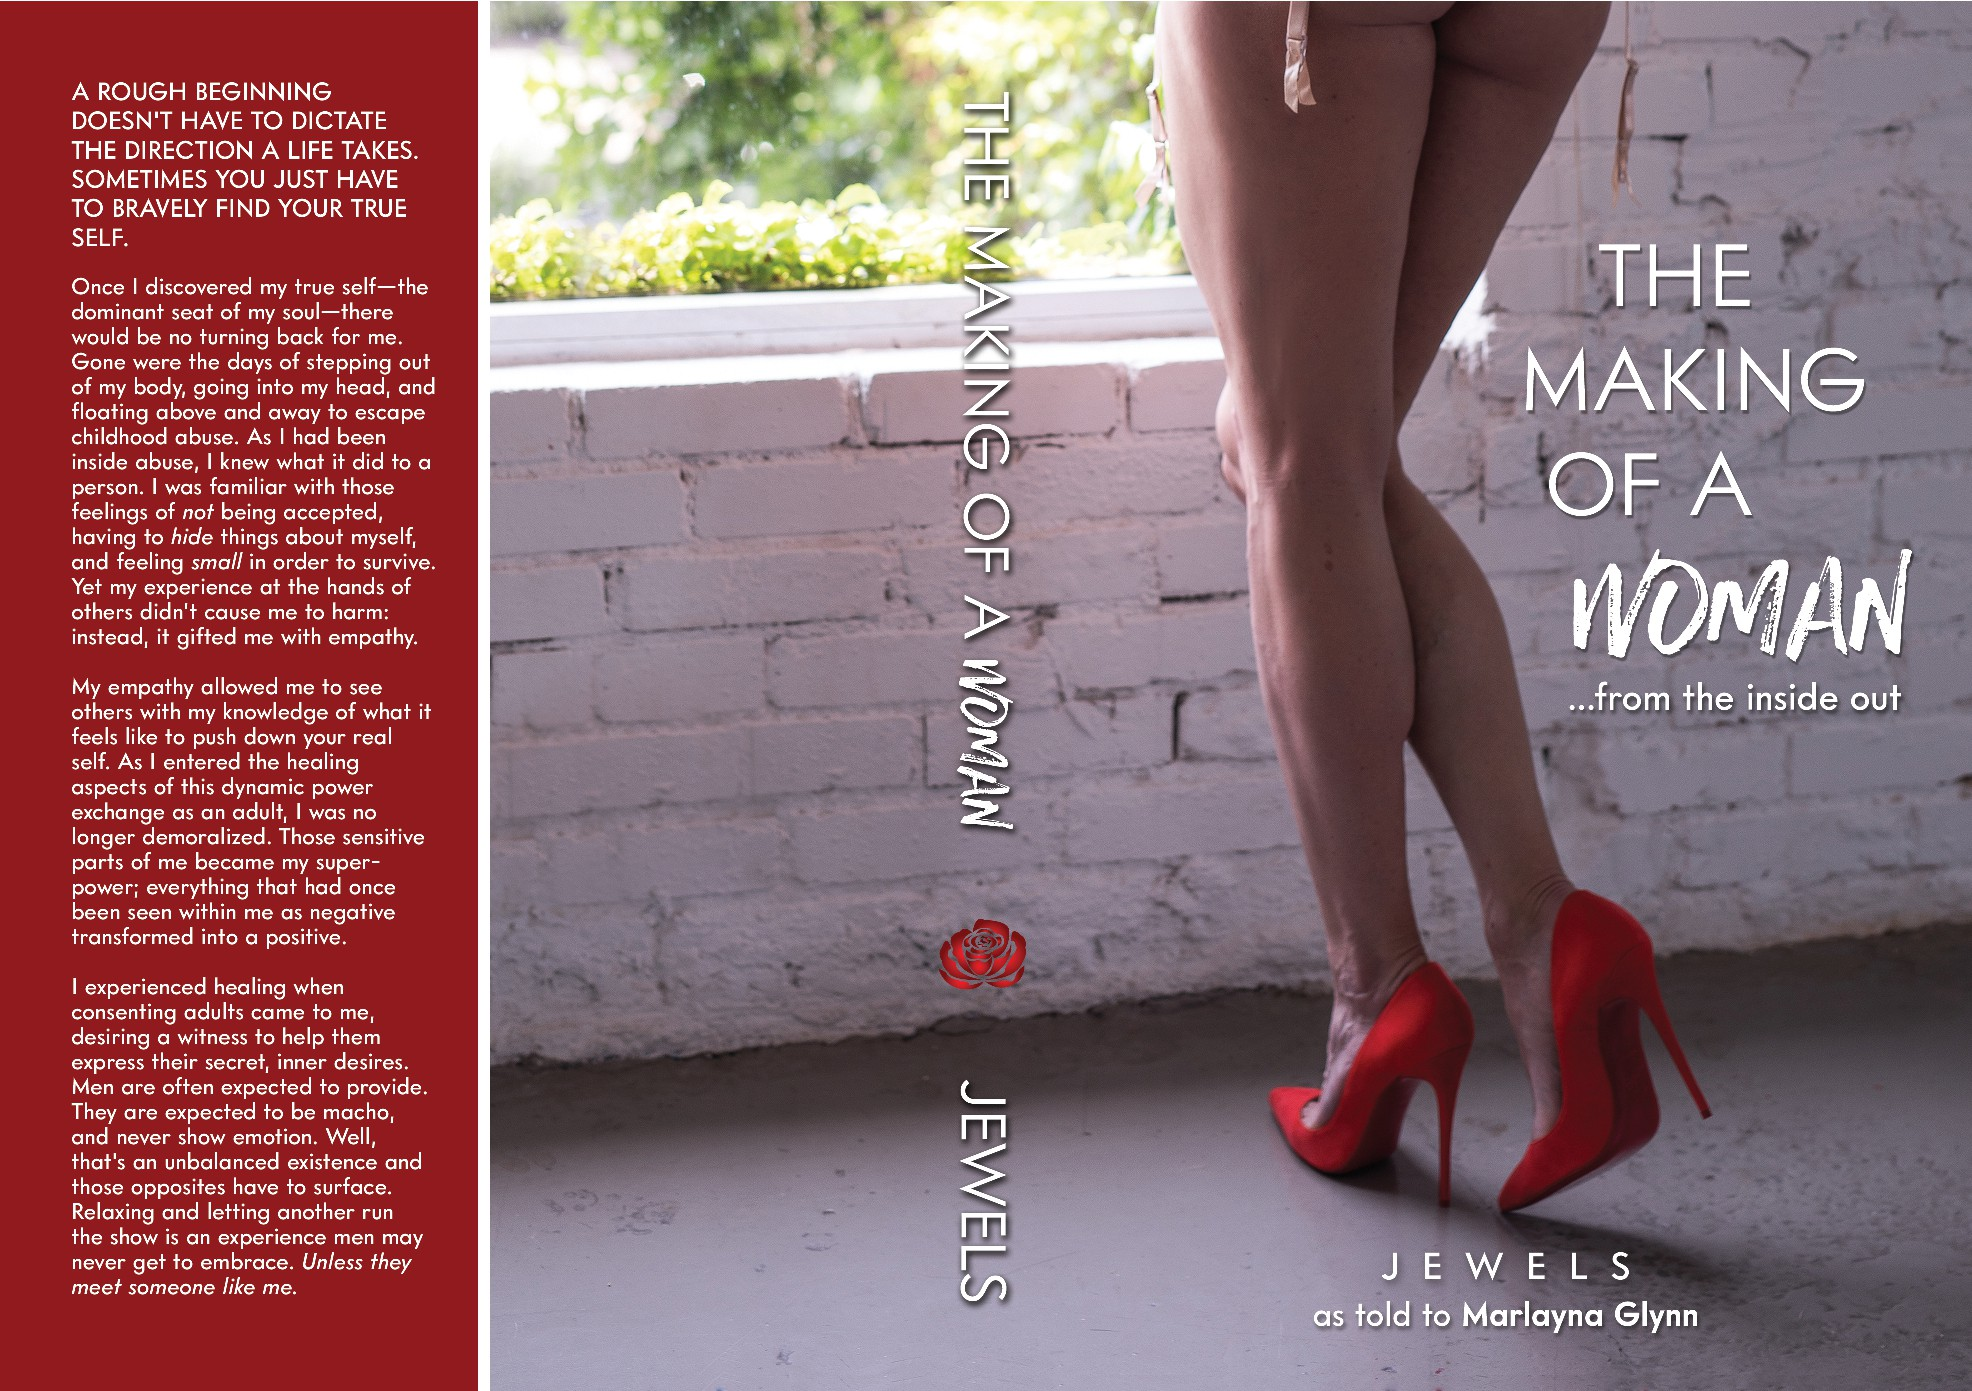 dominatrix and professional escort desires a cover